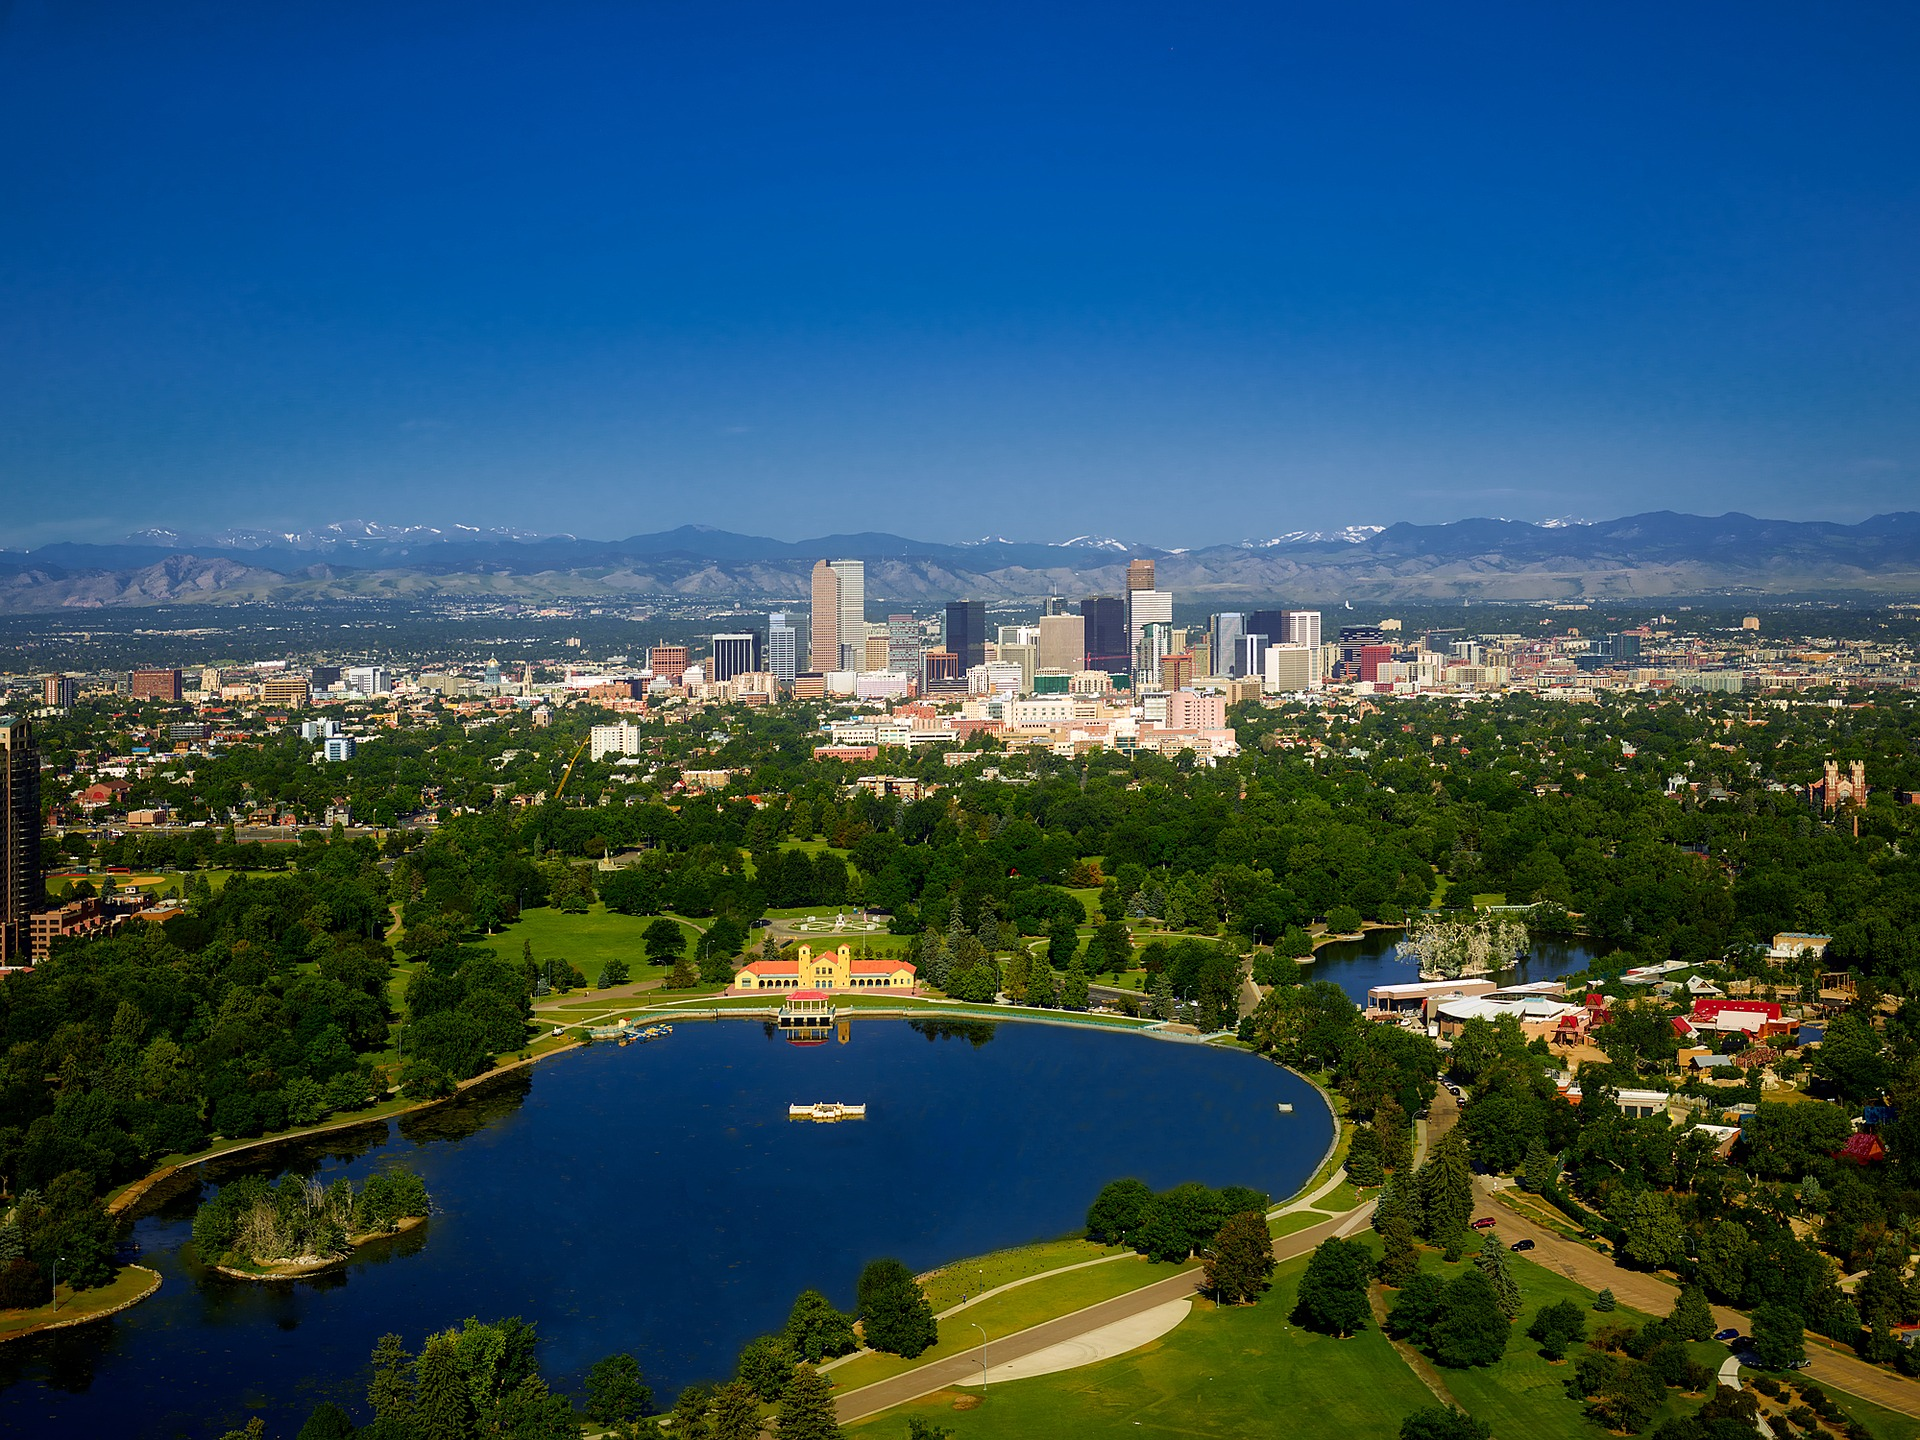 Centennial Tinting in Denver